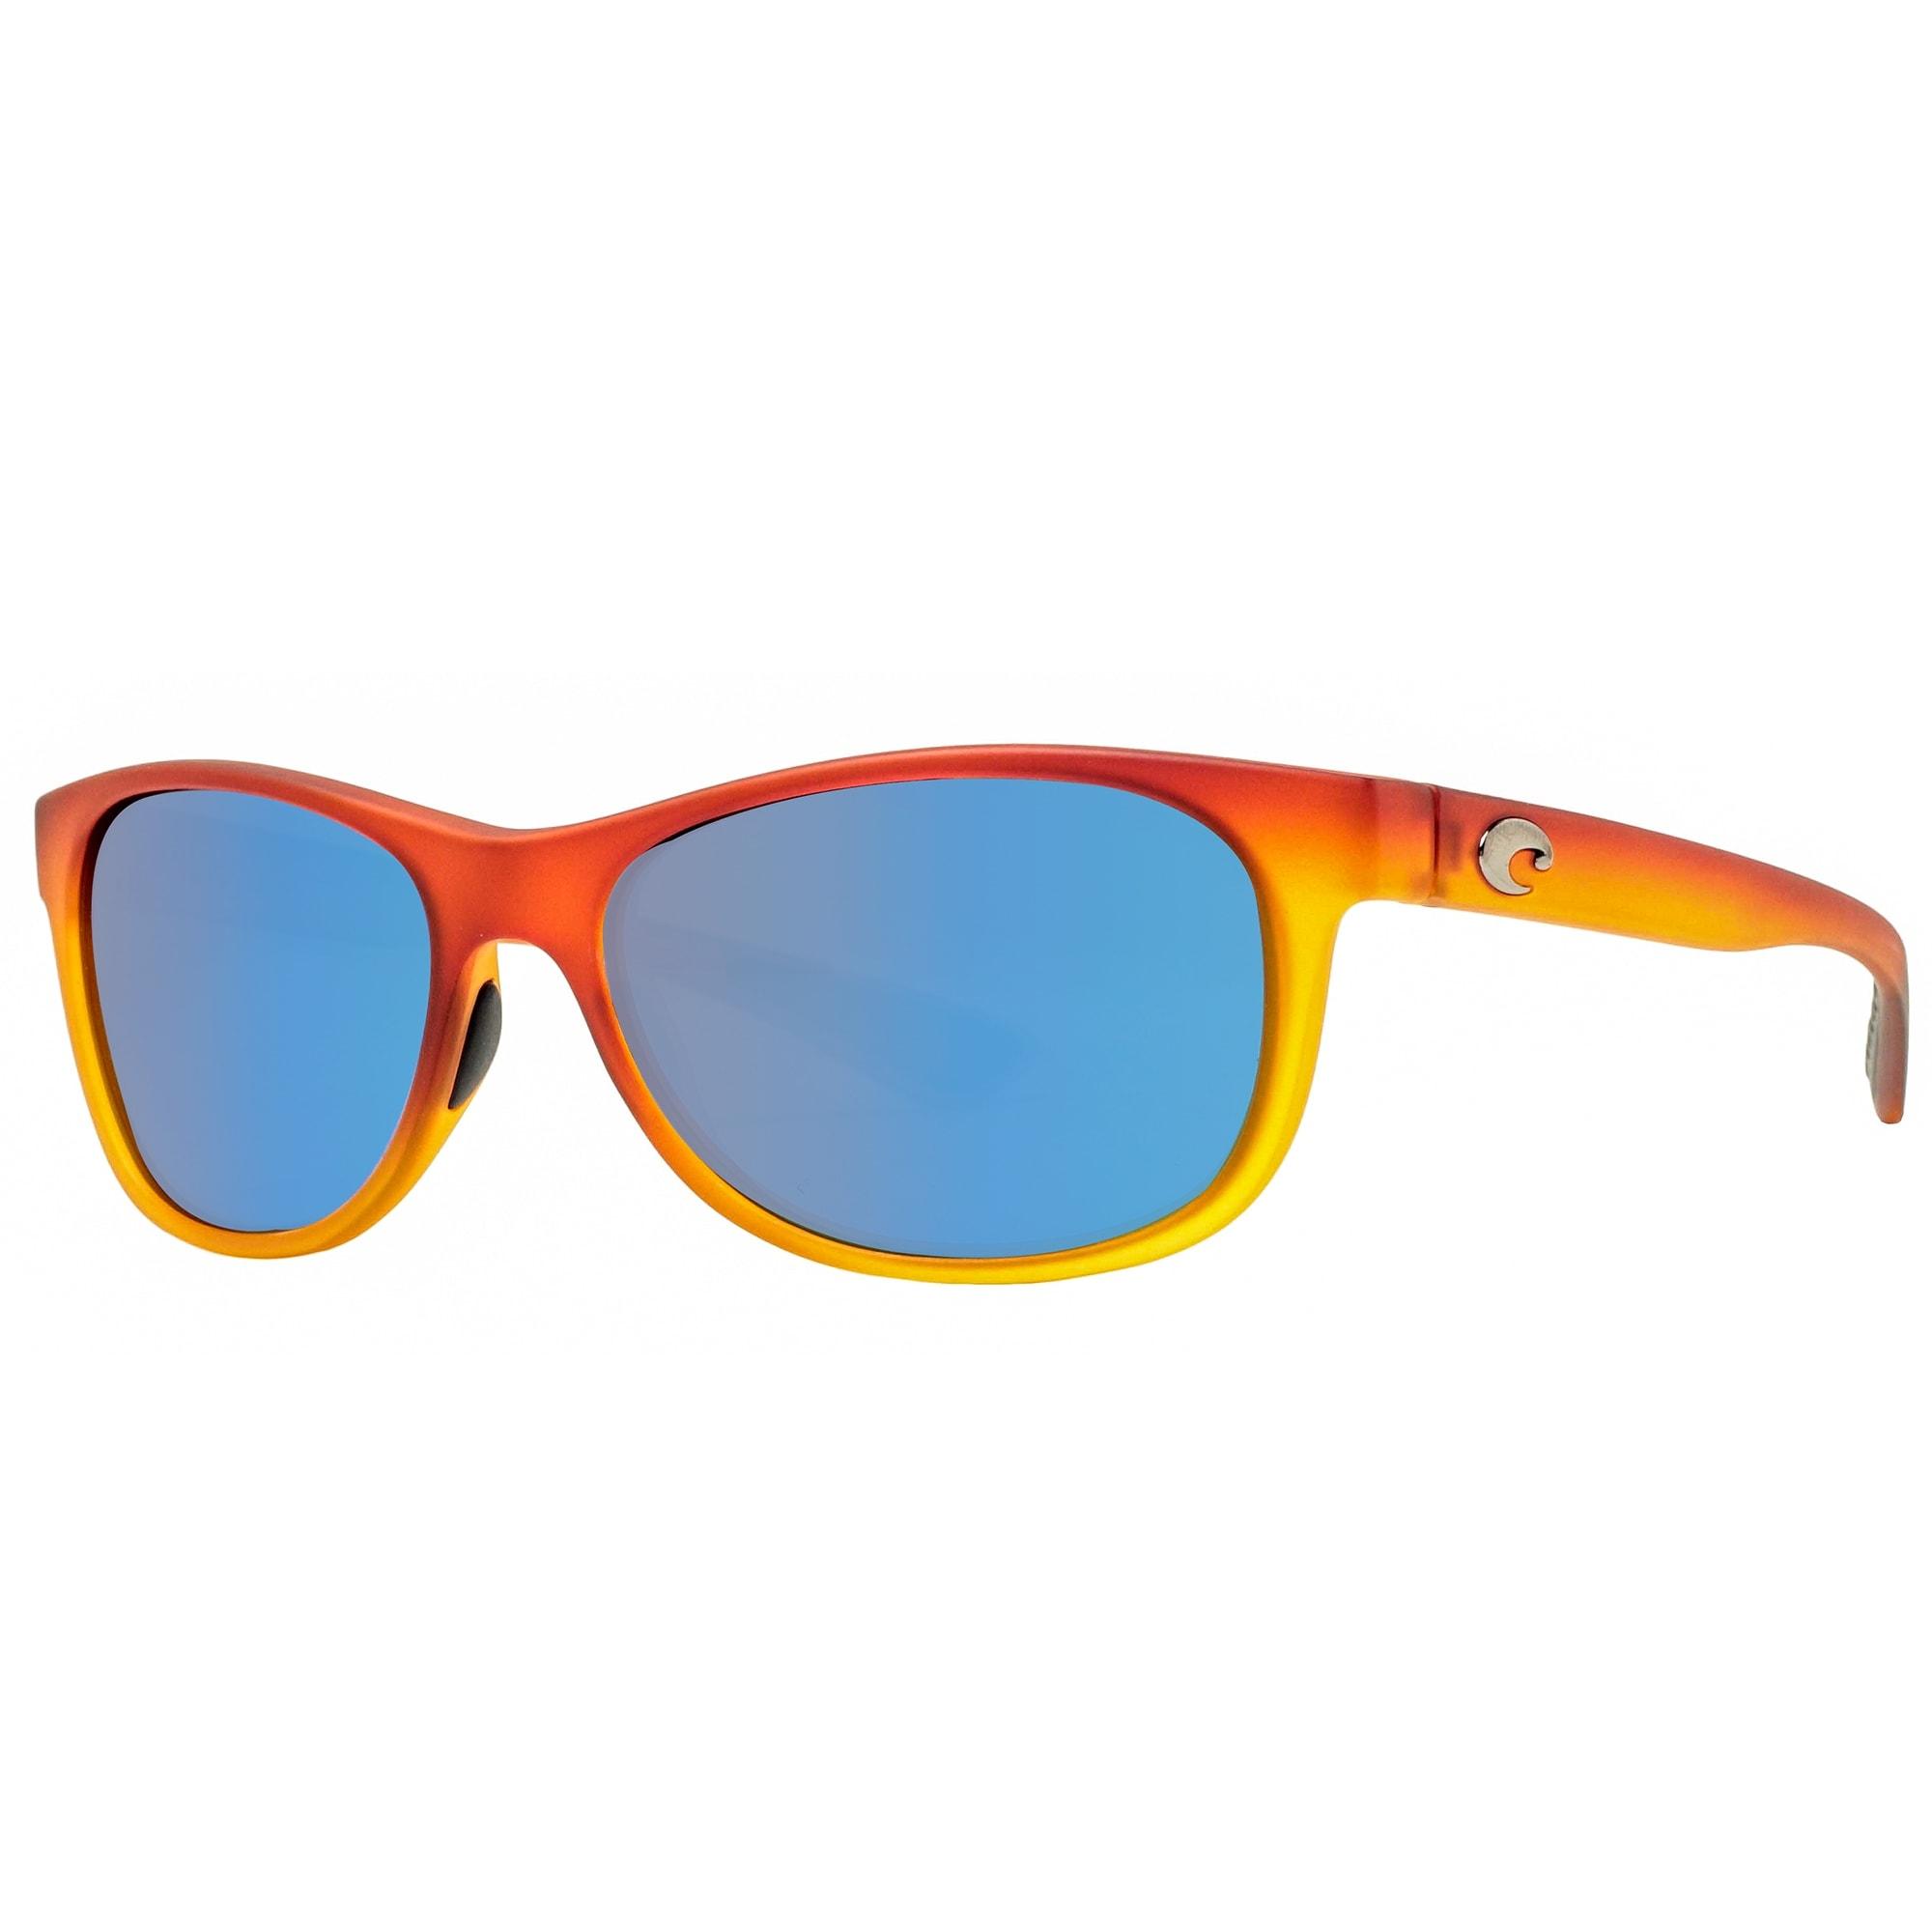 Costa Del Mar Prop Polarized Sunglasses-Sunset Fade//Blue Mirror 400G Glass Lens